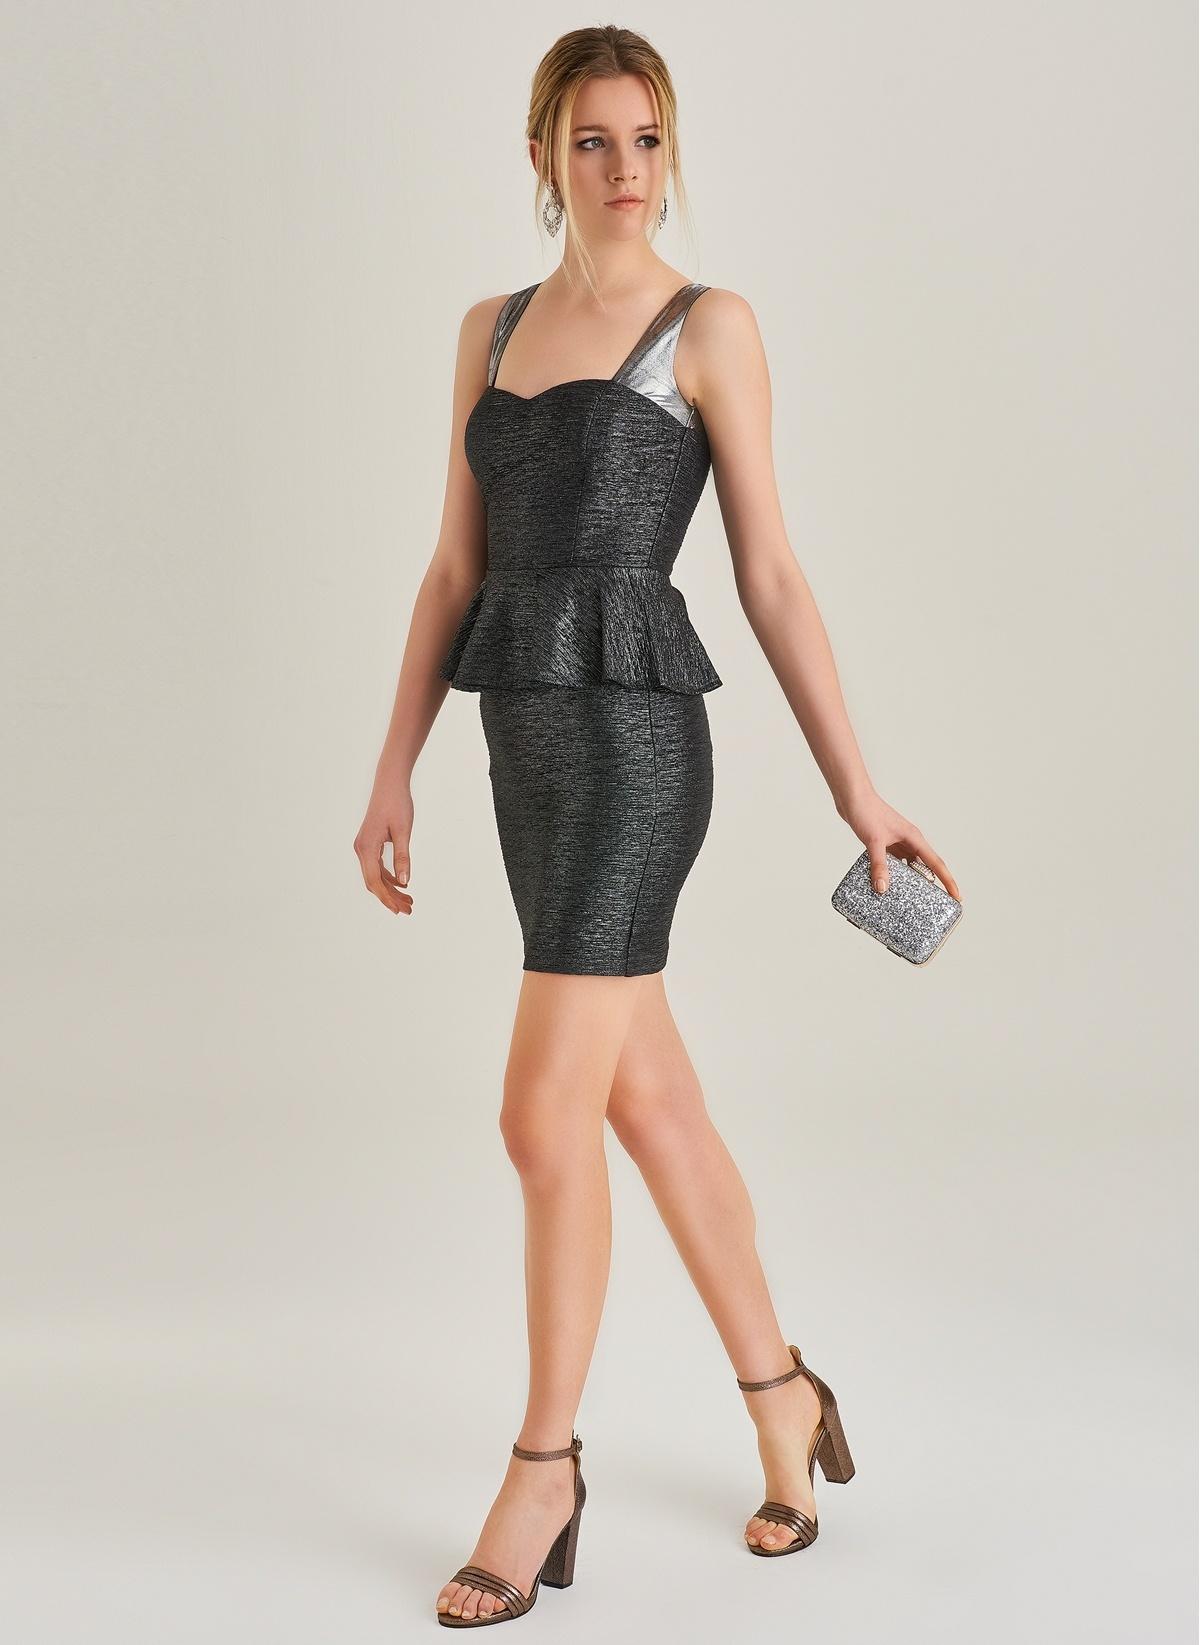 587b800cc3d58 People By Fabrika Kadın Askılı Elbise Antrasit | Morhipo | 20892080